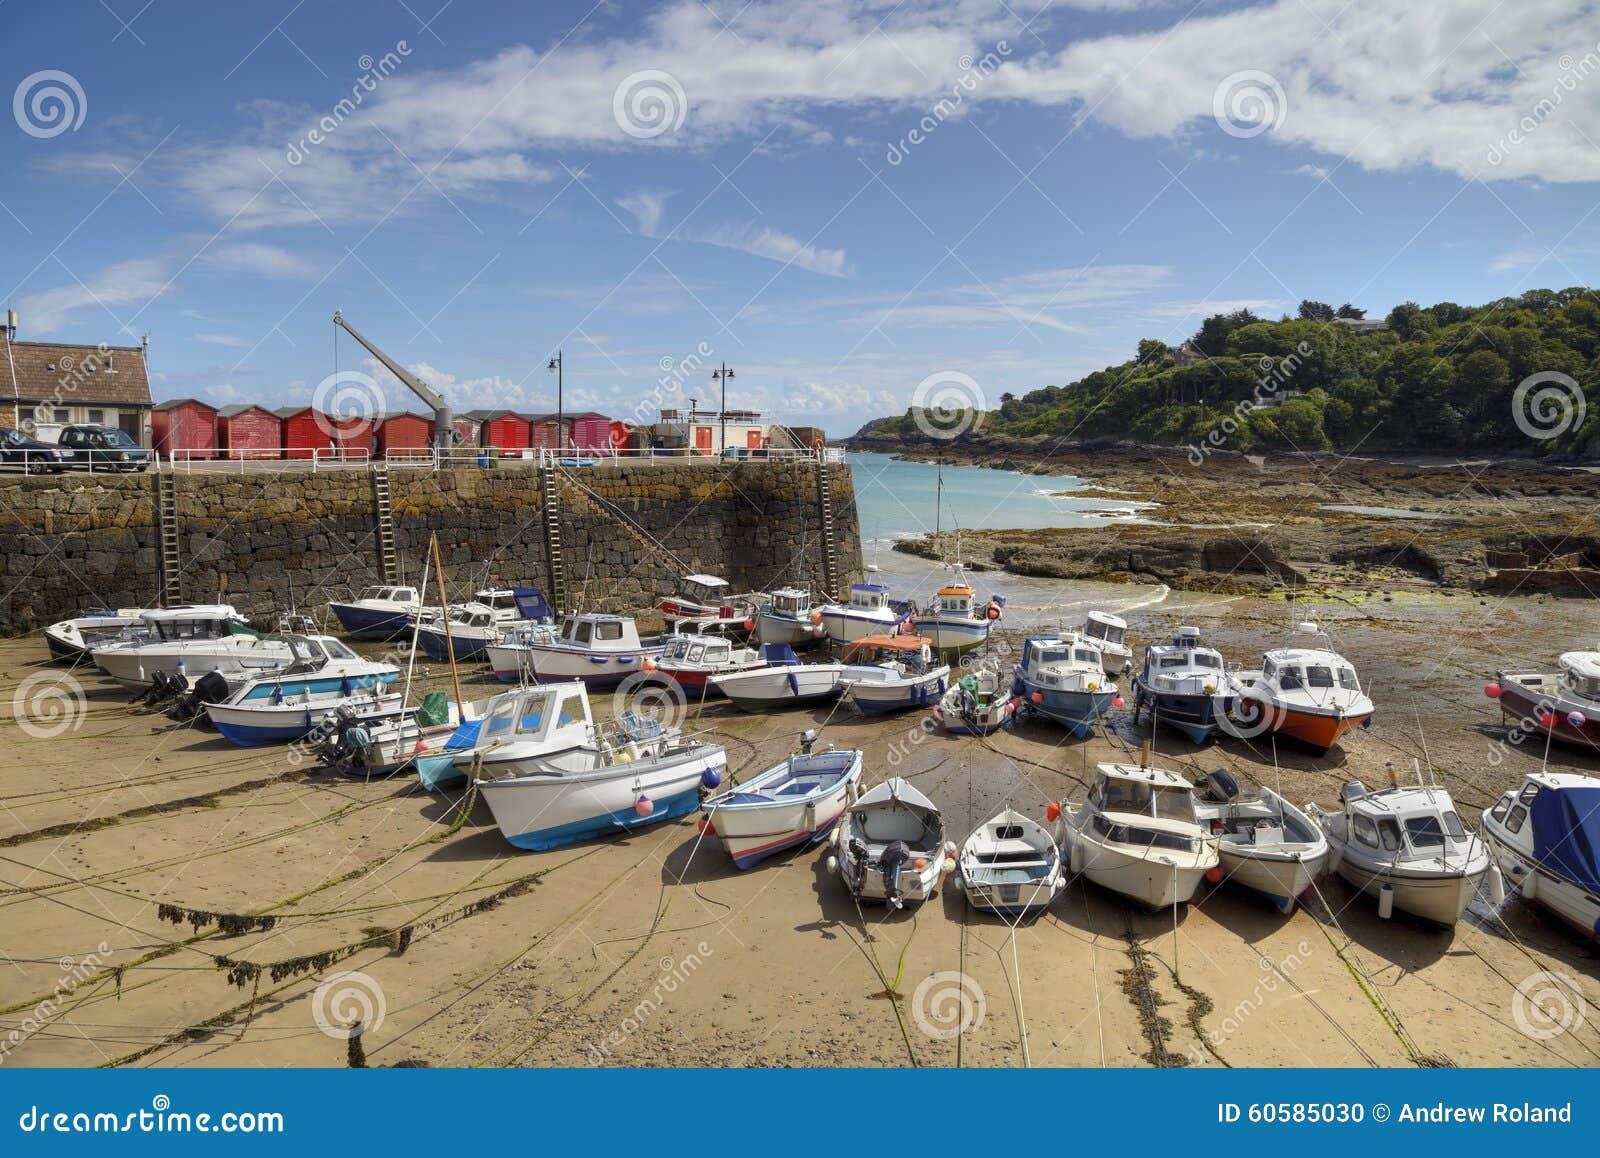 Web Design Jersey Channel Islands